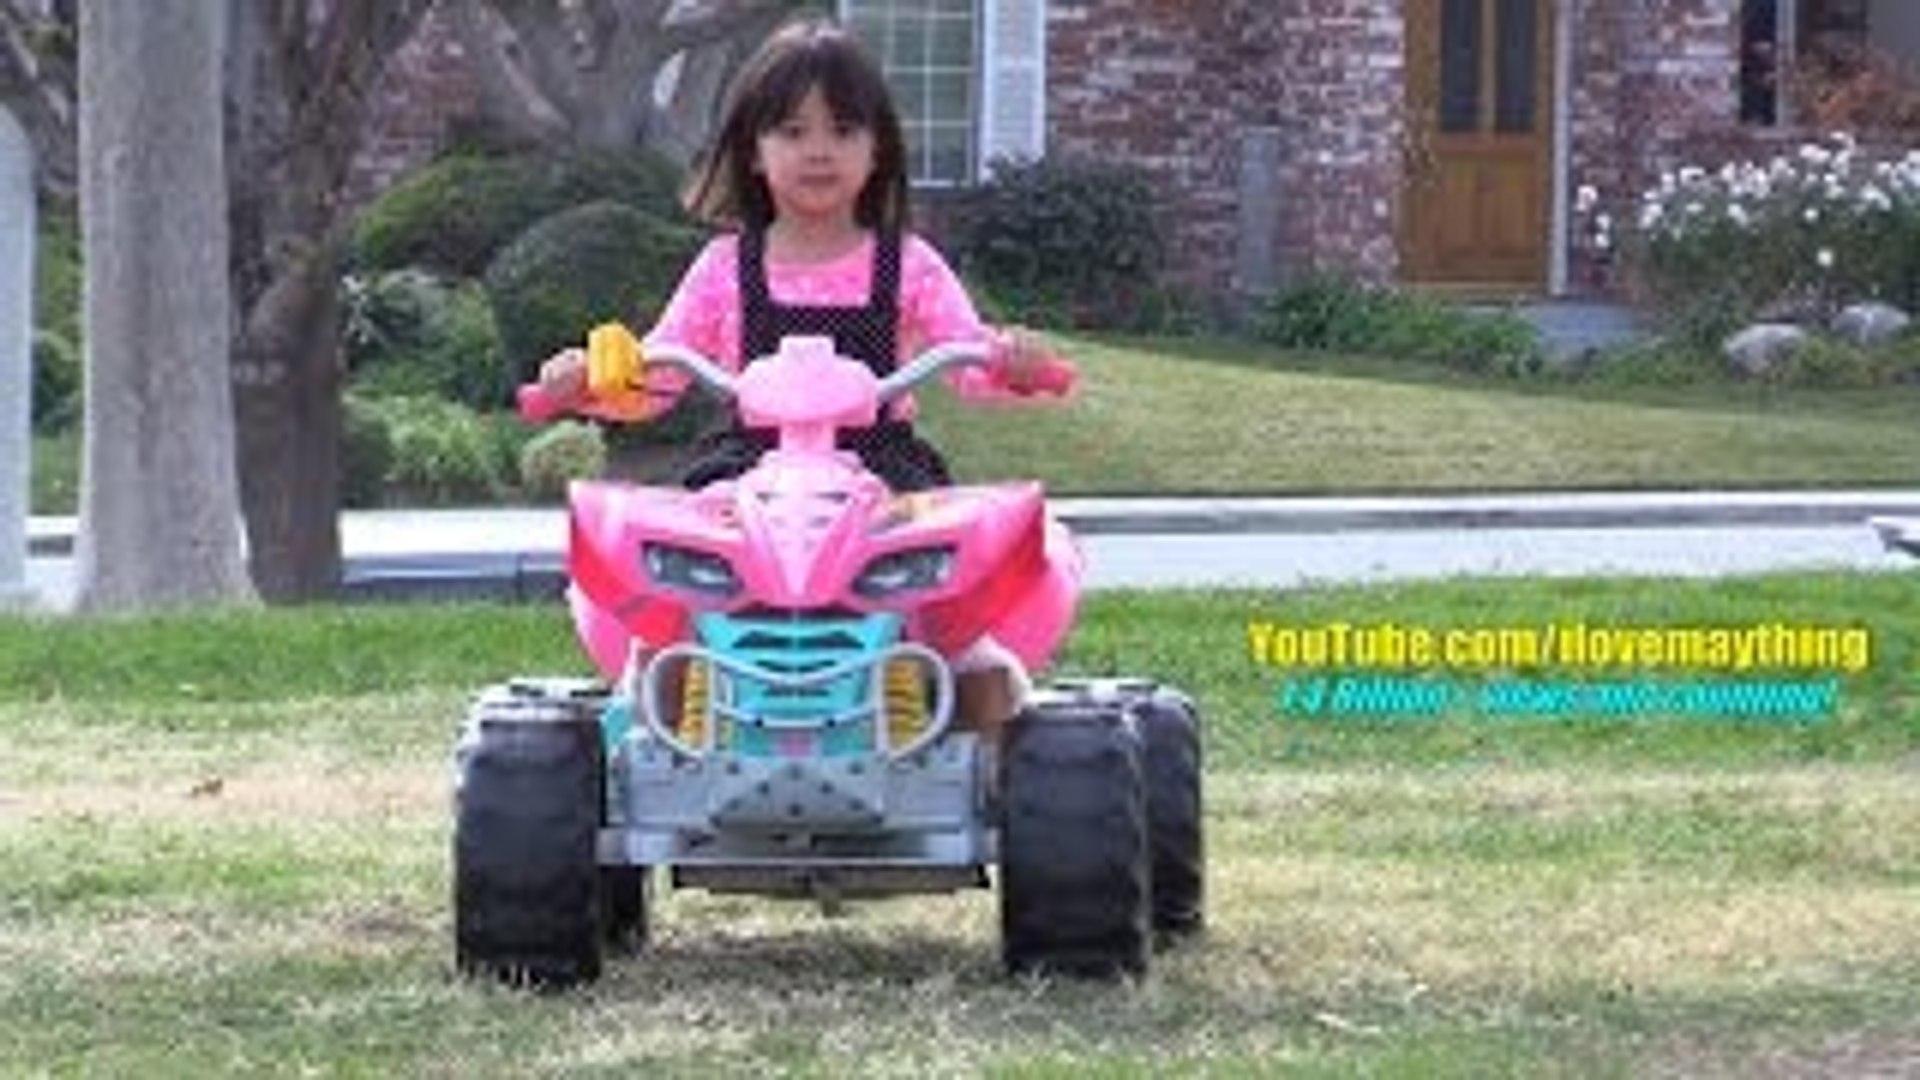 Fisher Price 12 Volts Ride On Power Wheels Mayas Pink Barbie Kawasaki Quad Atv Ride Dailymotion Video